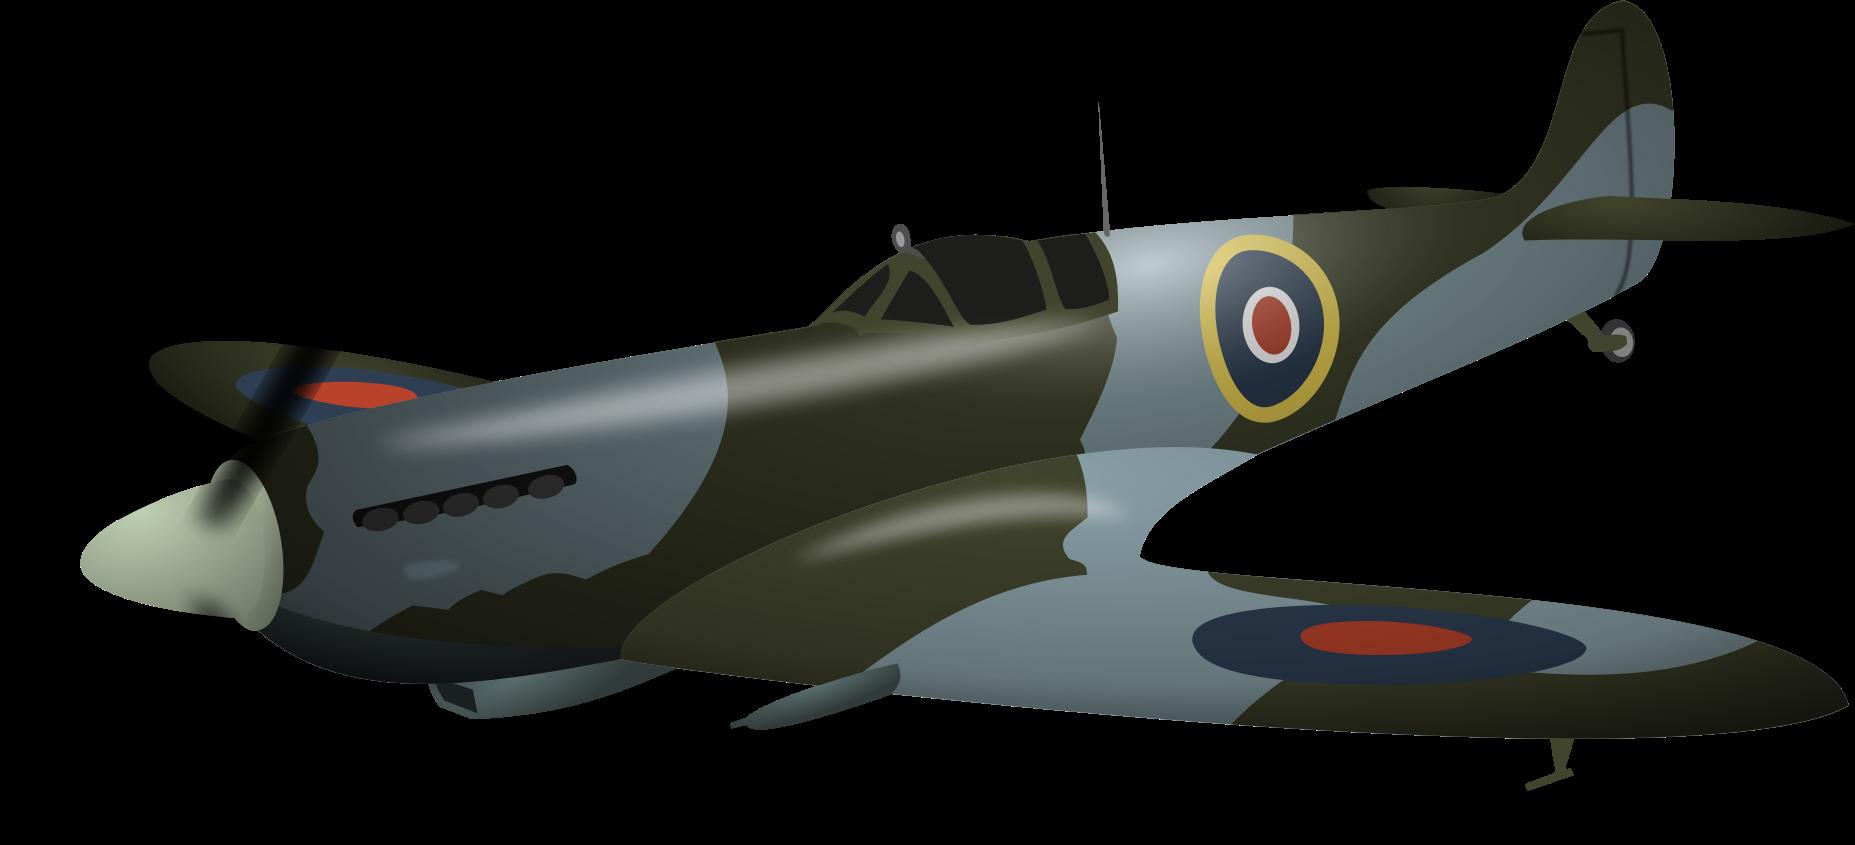 Clipart of world war ii planes.